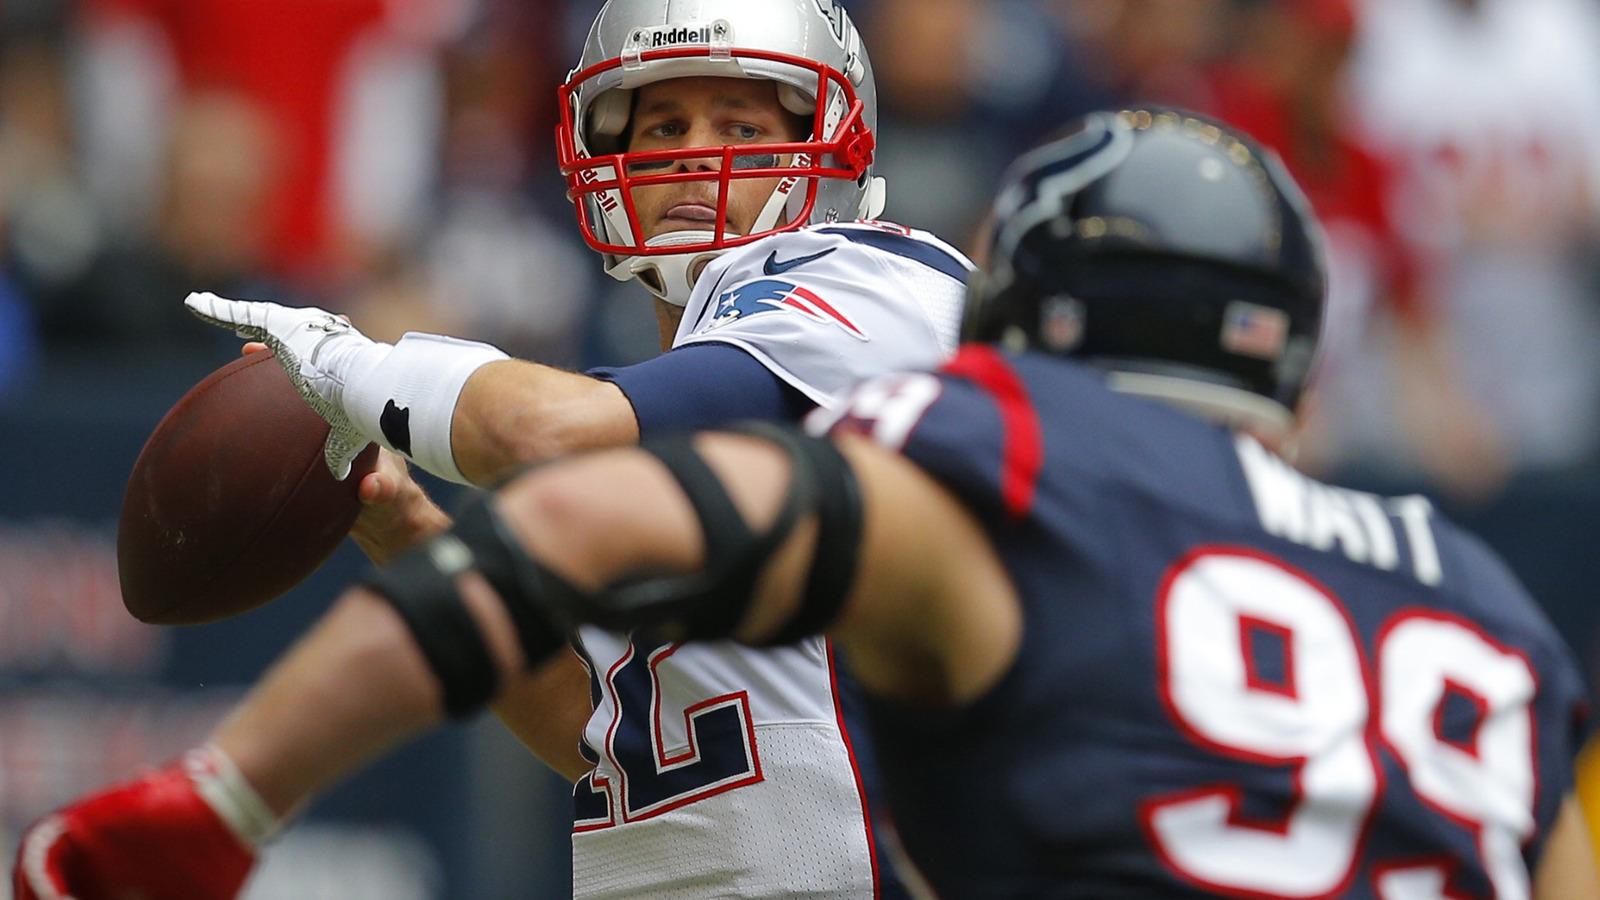 Top 10 matchups for Week 14: JJ Watt chasing Tom Brady? Count us in